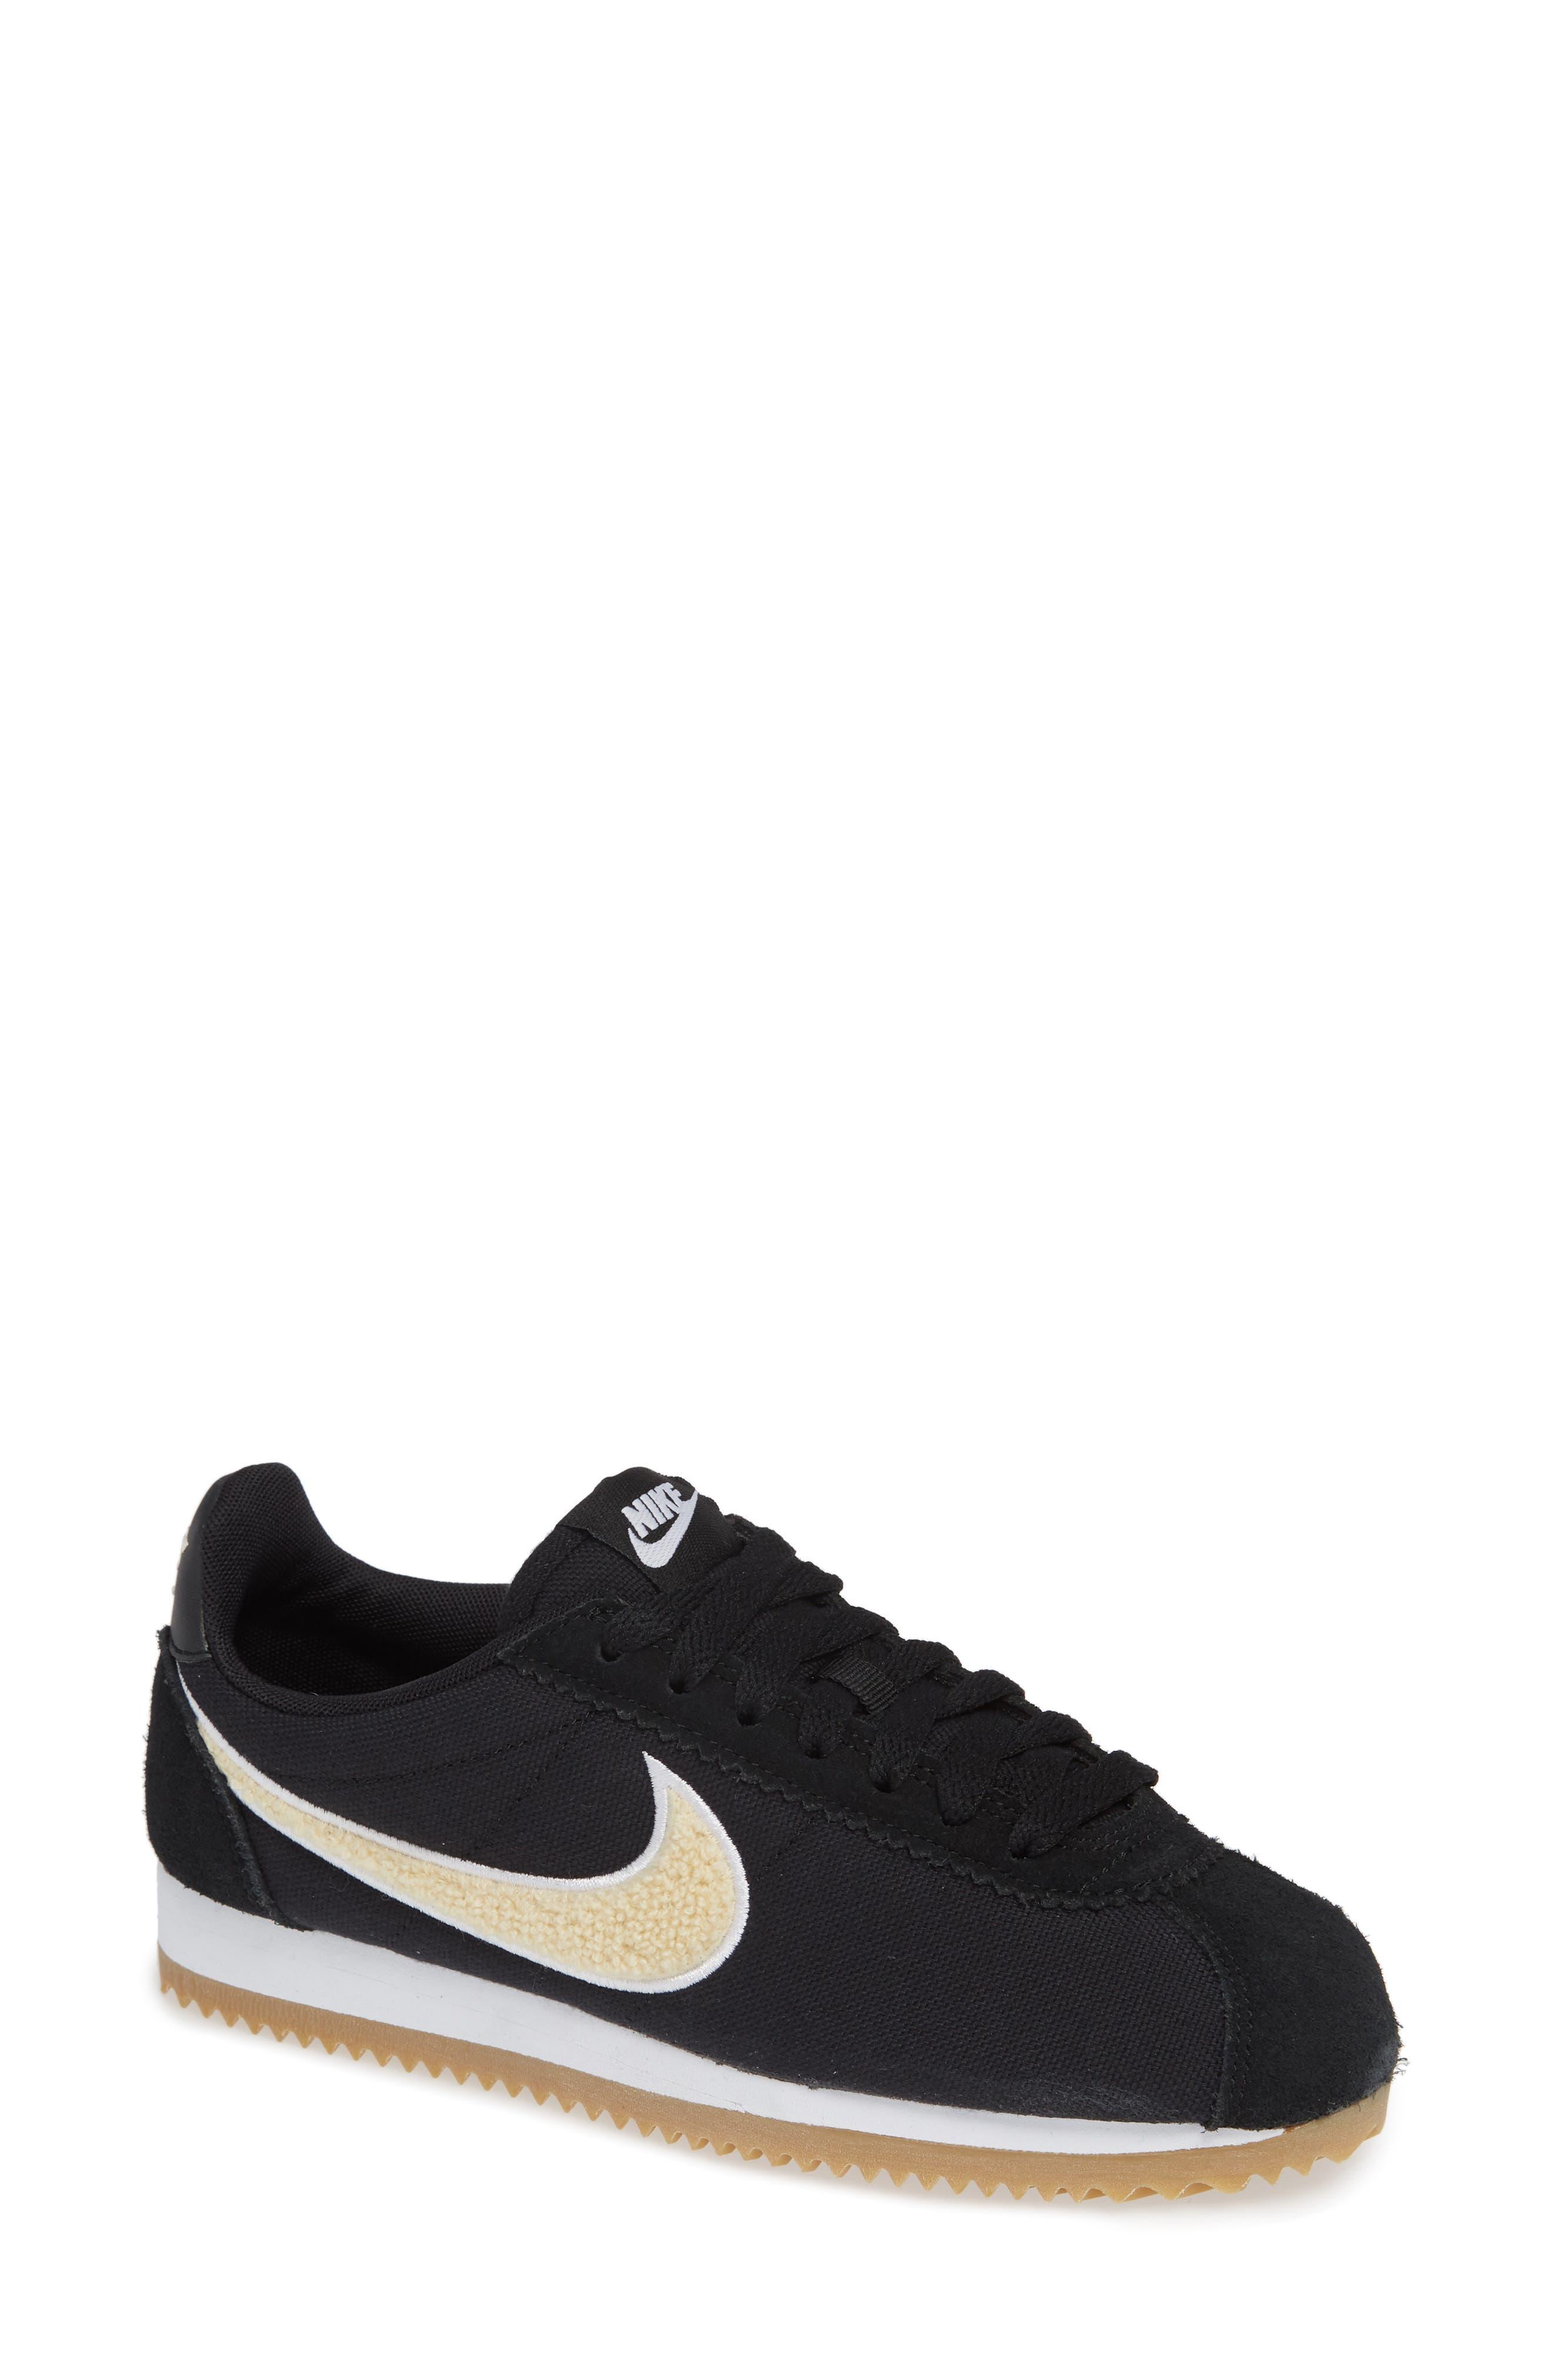 Classic Cortez Premium XLV Sneaker,                         Main,                         color, Black/ Light Cream/ Brown